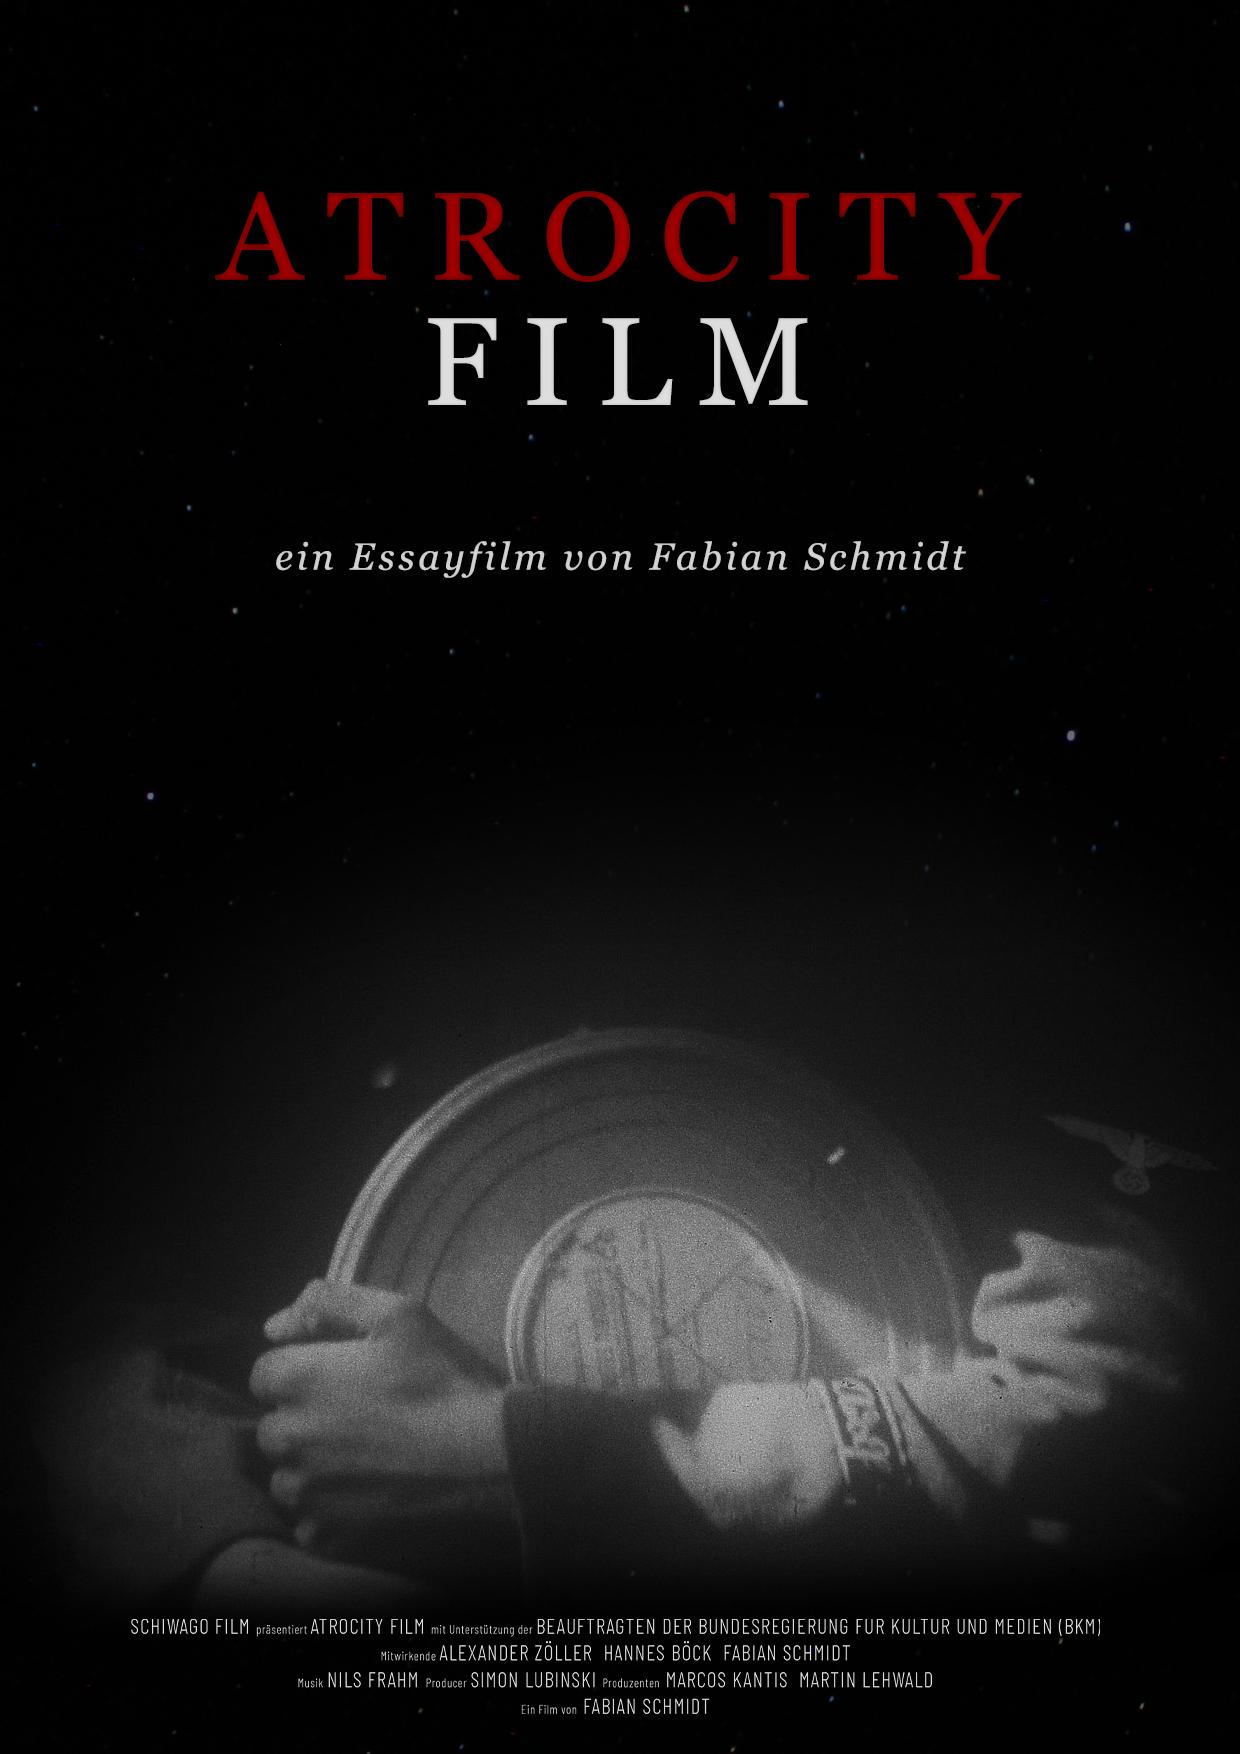 Atrocity Film